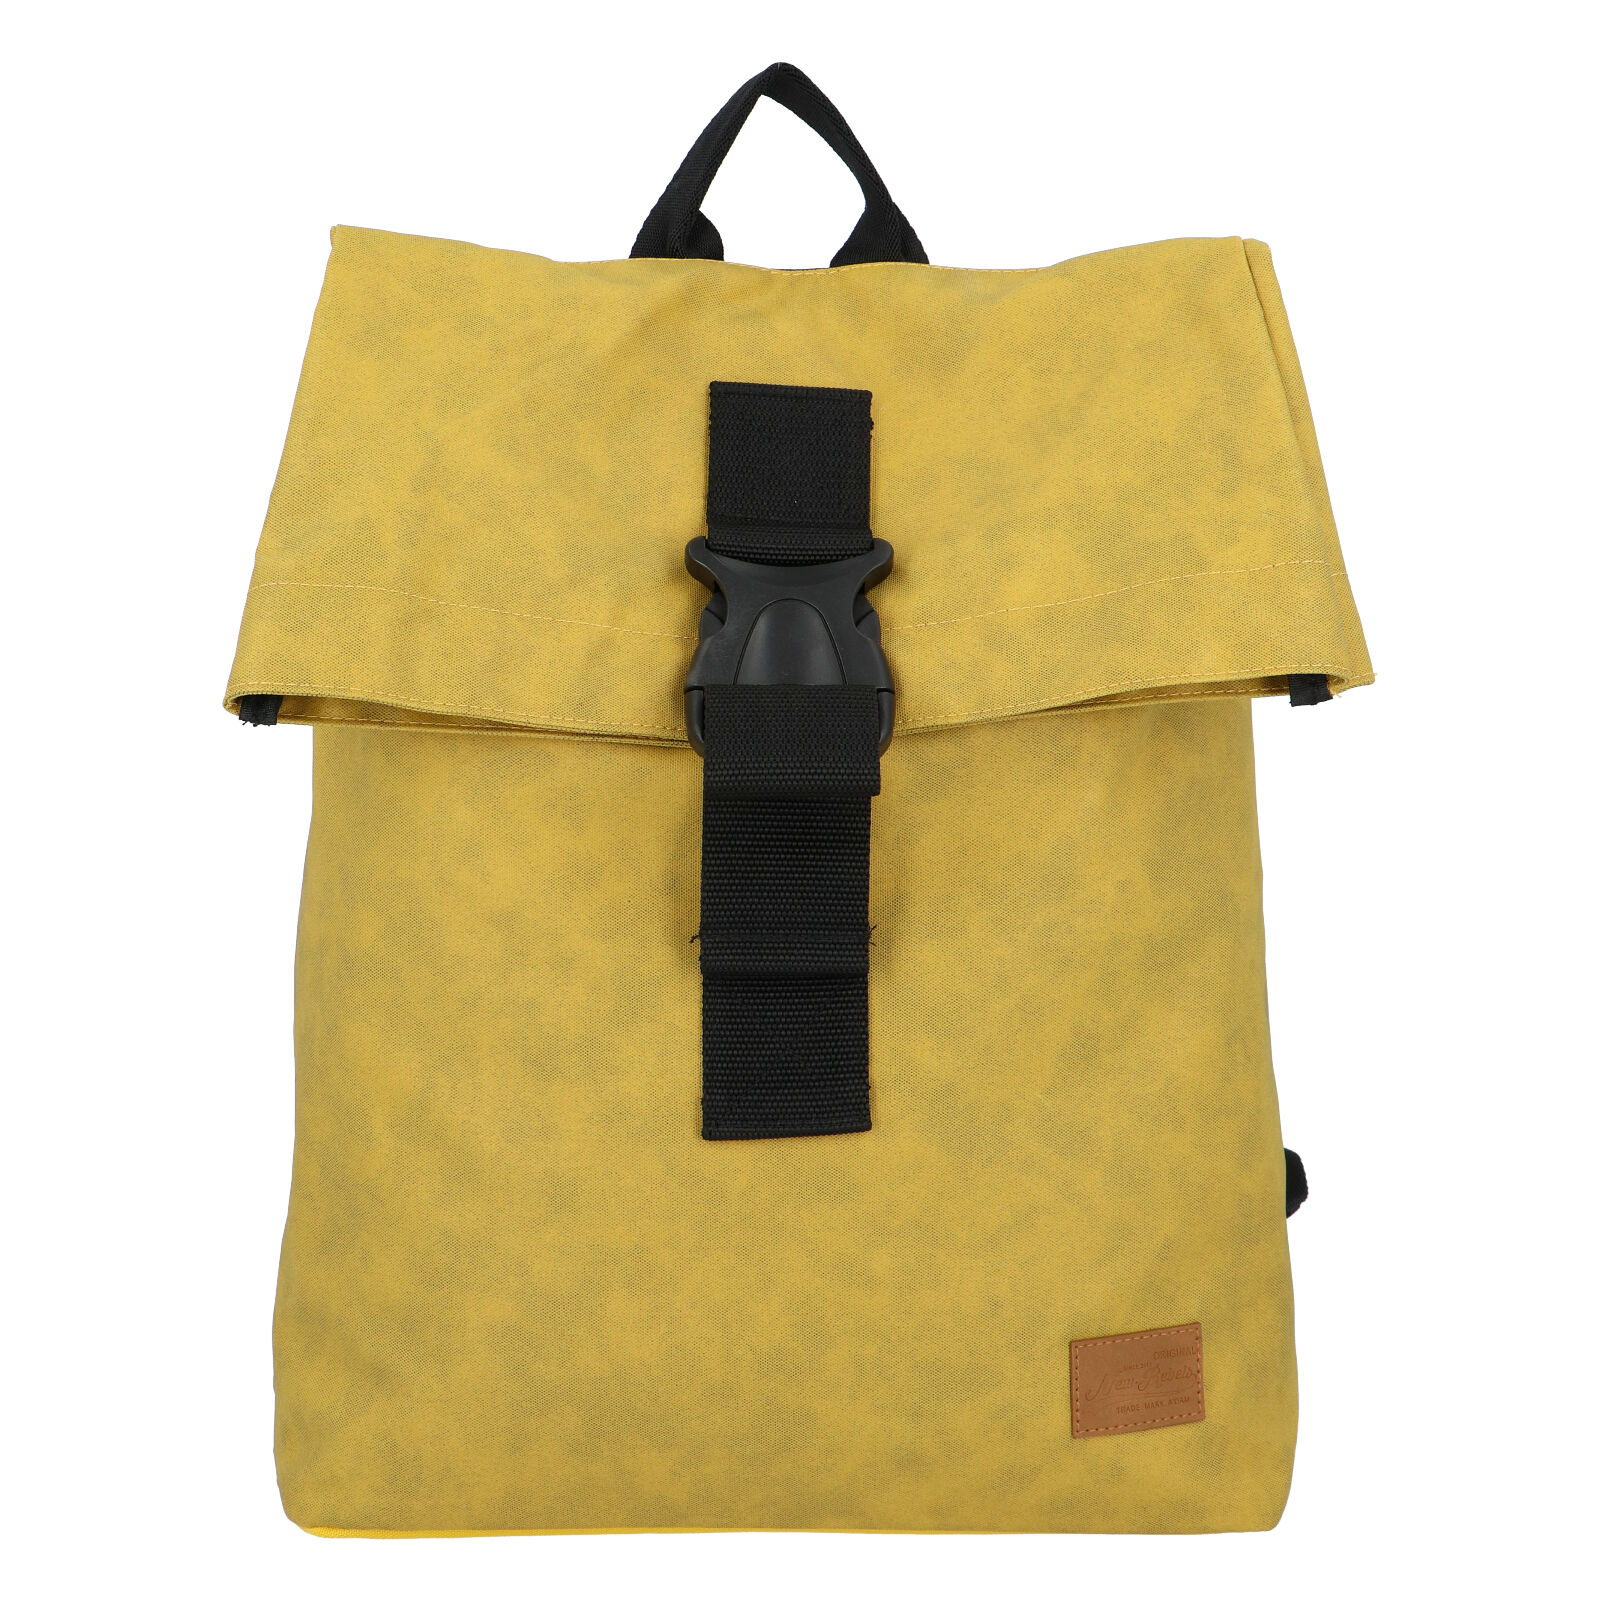 Pánský batoh tmavě žlutý - New Rebels Rebell